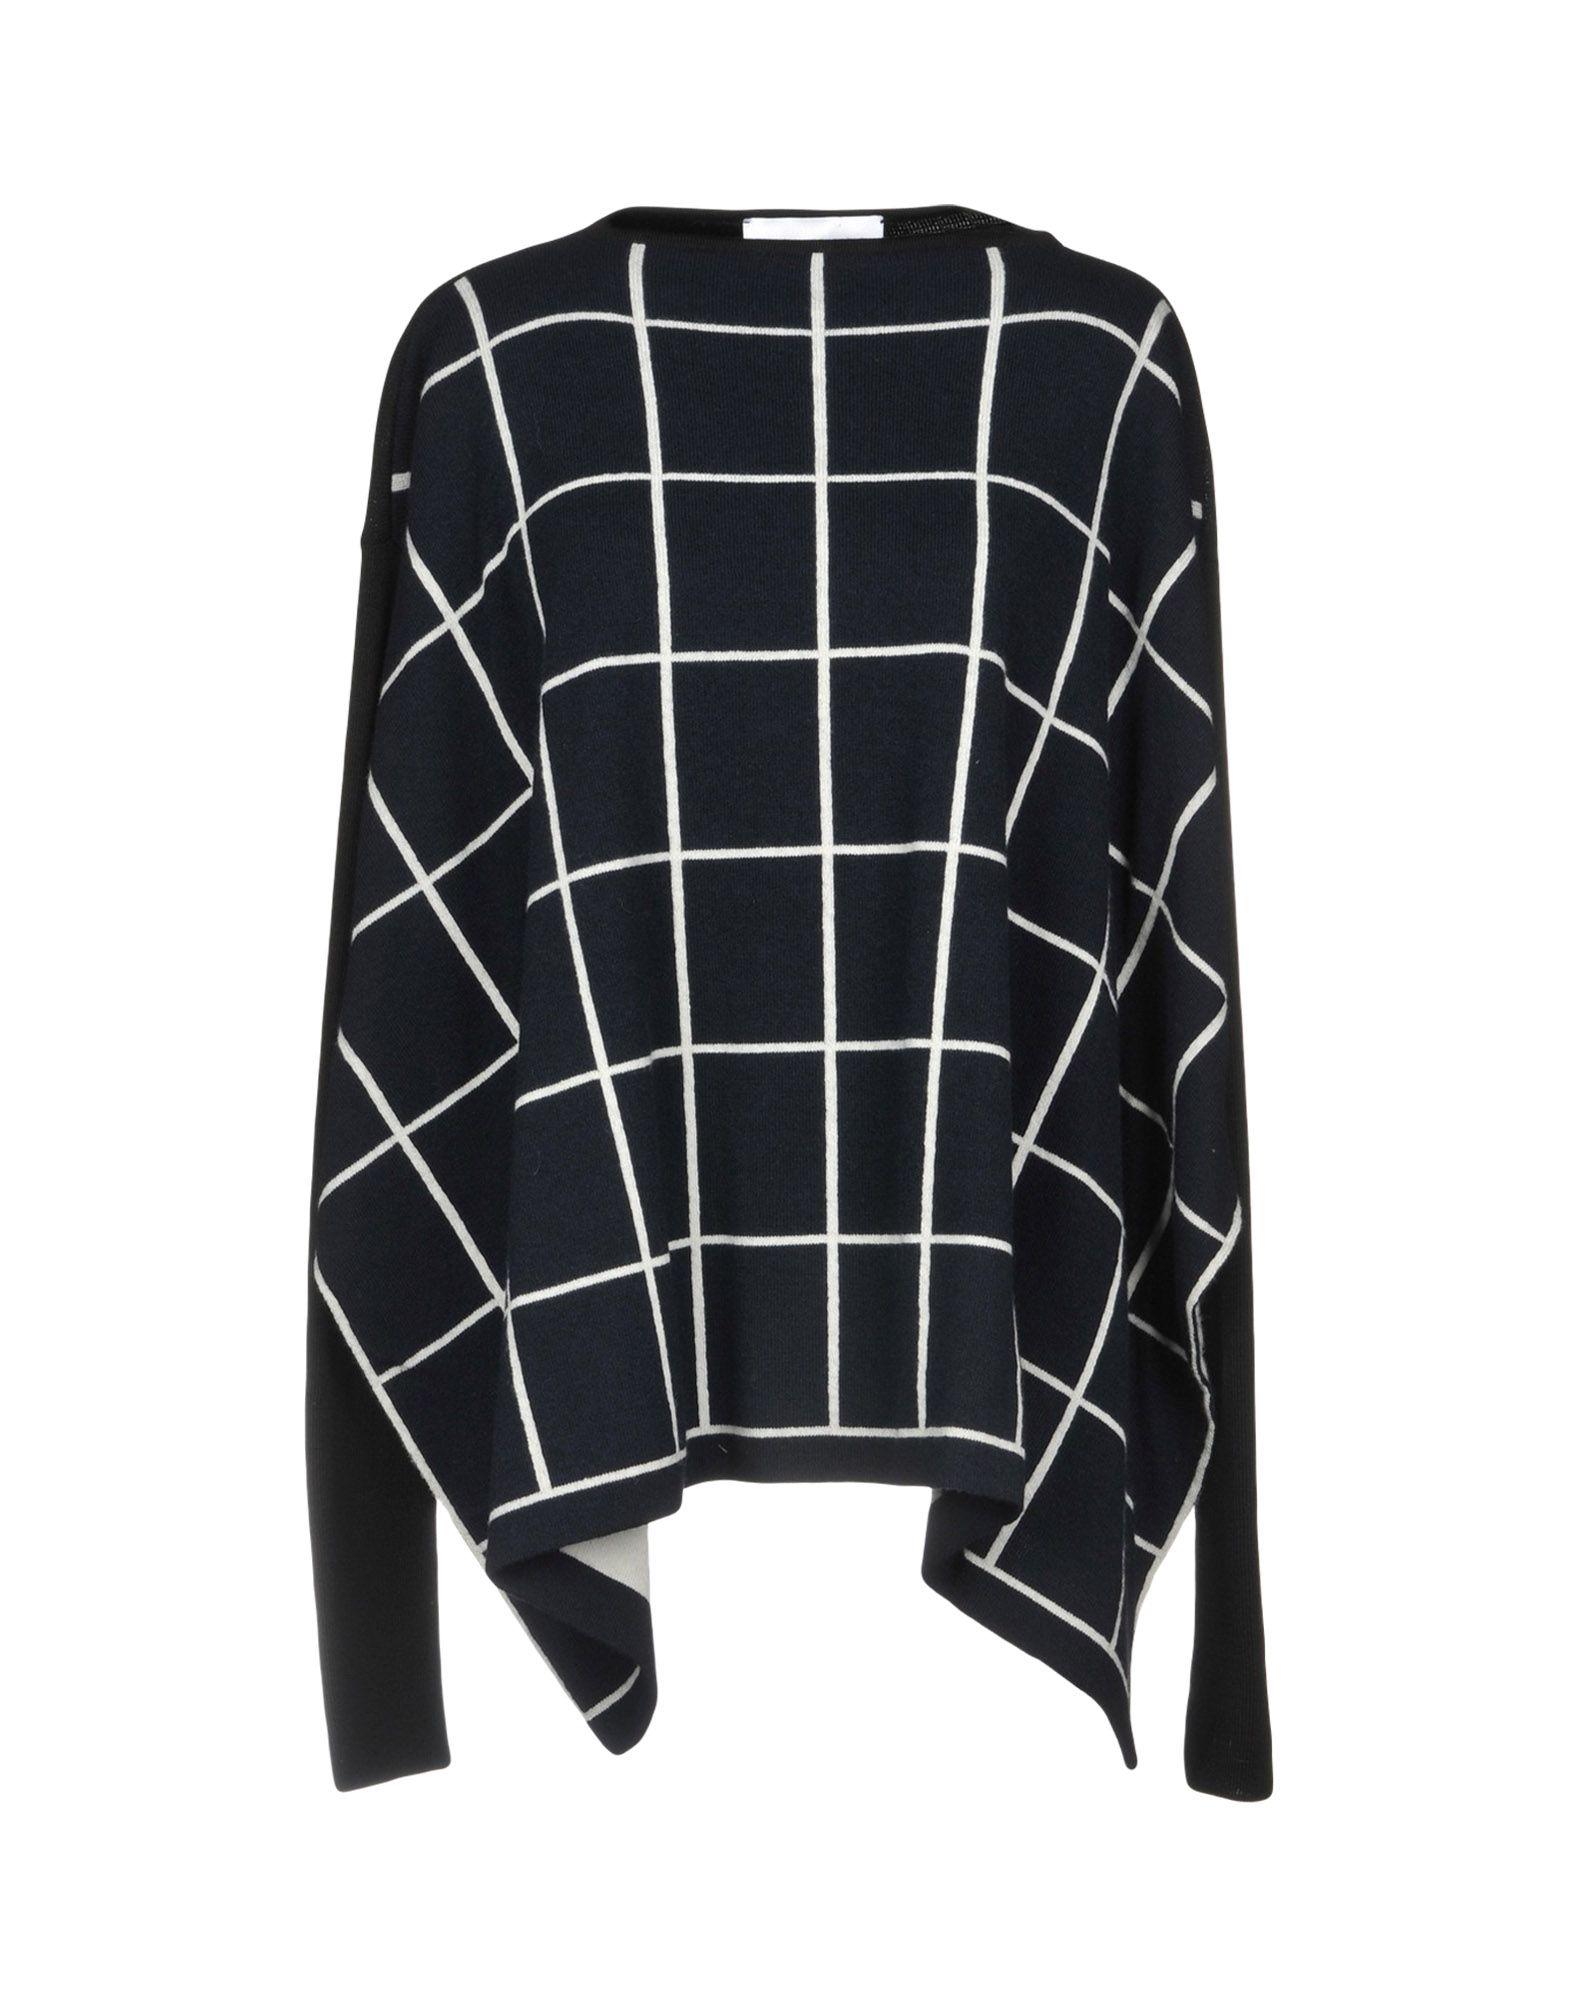 PAOLO ERRICO Sweaters in Dark Blue